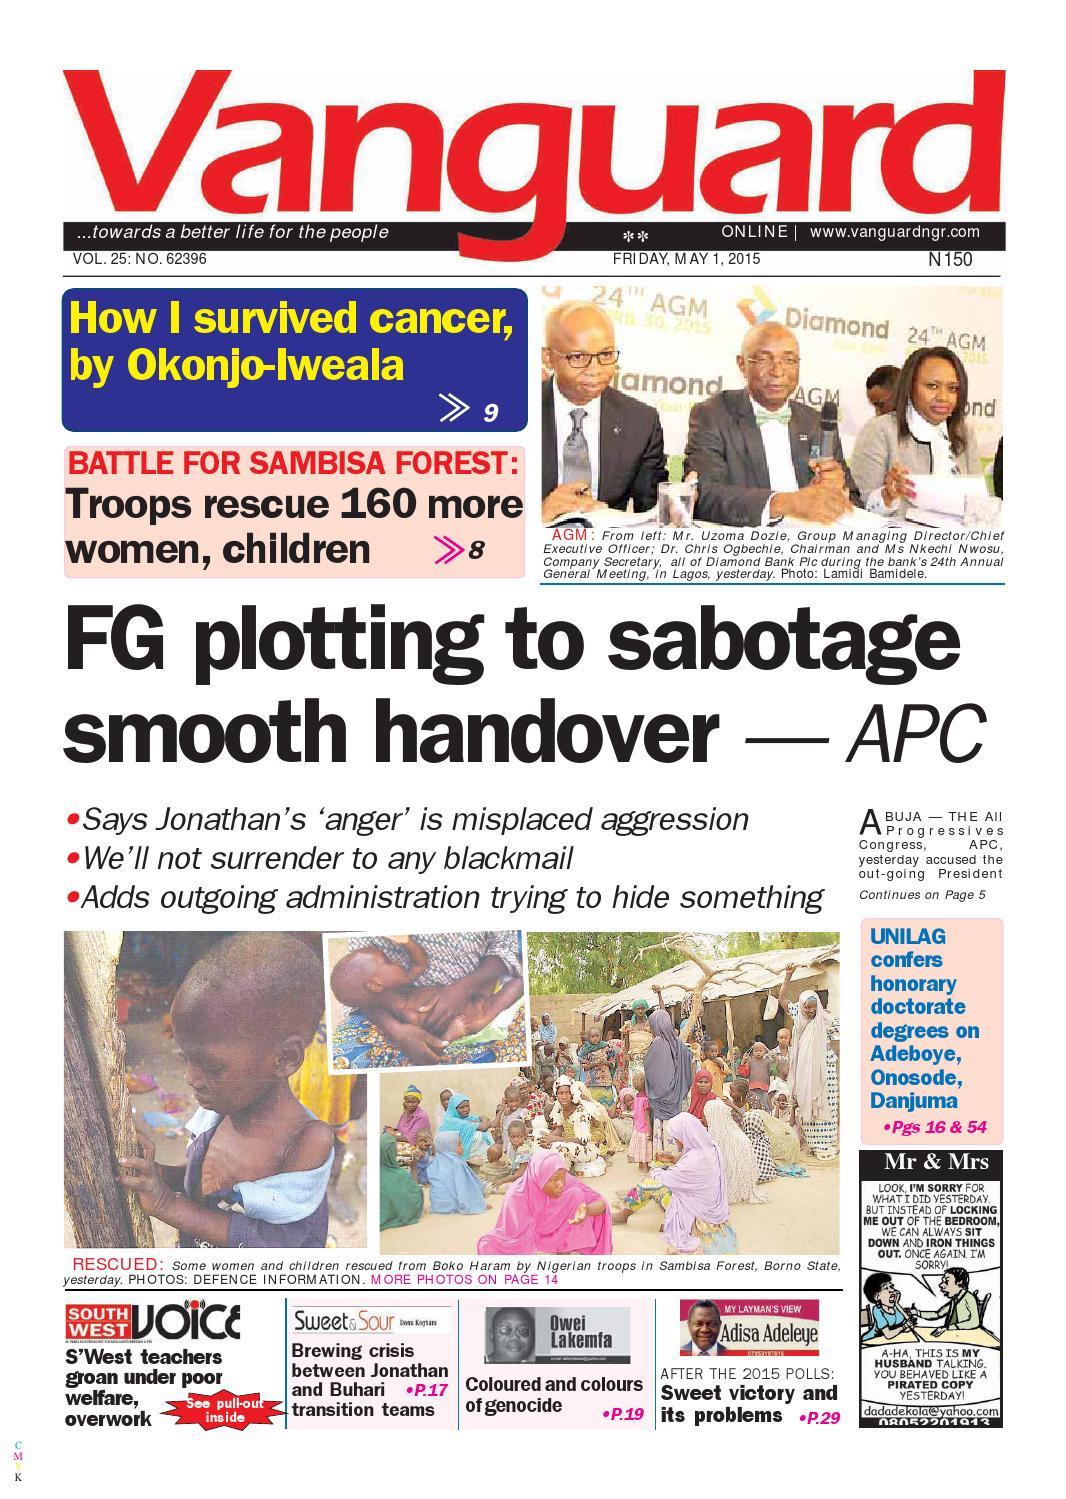 Fg Plotting To Sabotage Smooth Handover Apc By Vanguard Media Limited Issuu